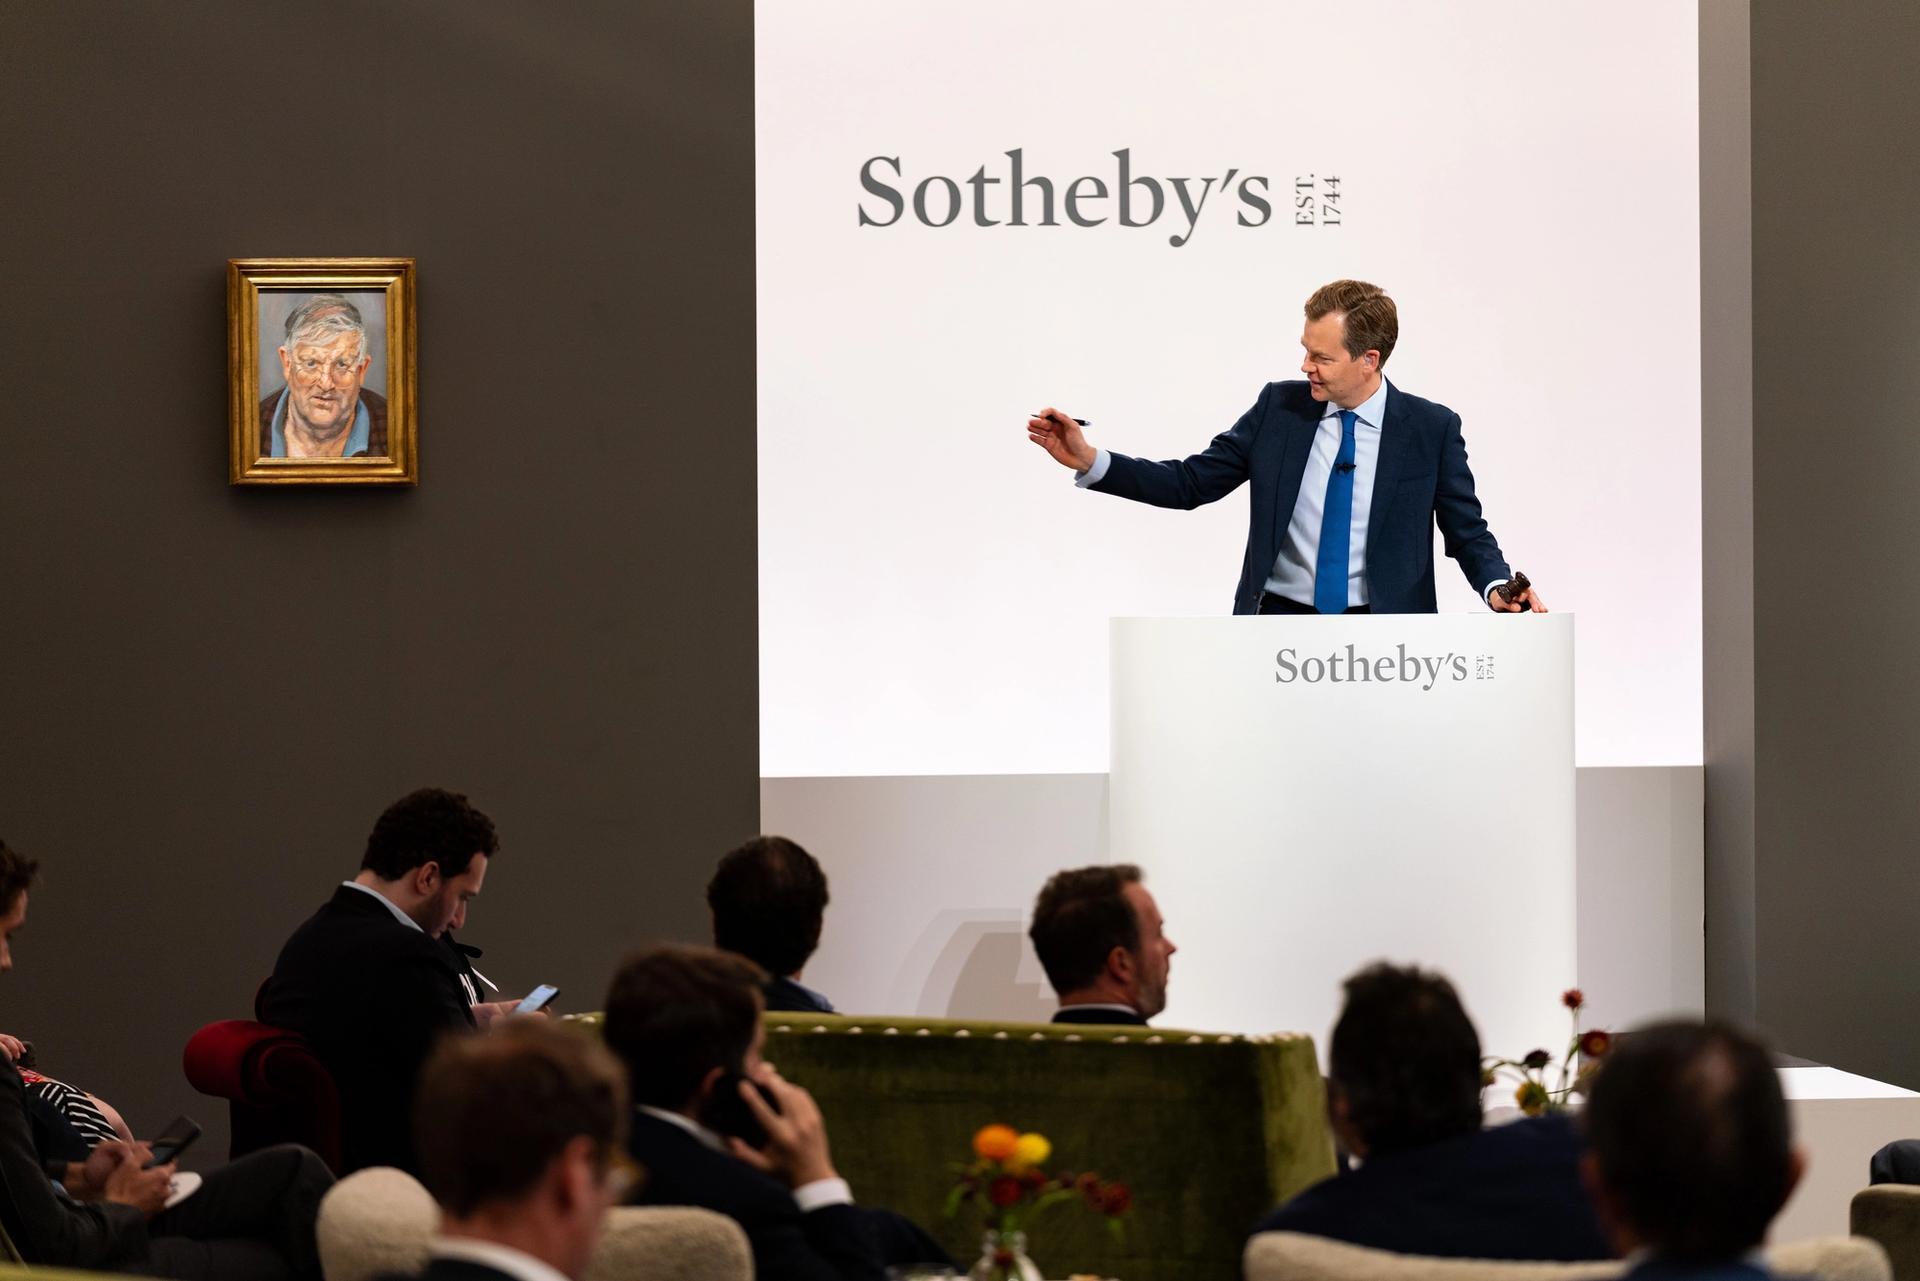 Oliver Barker at the rostrum of Sotheby's British Art evening sale Courtesy of Sotheby's